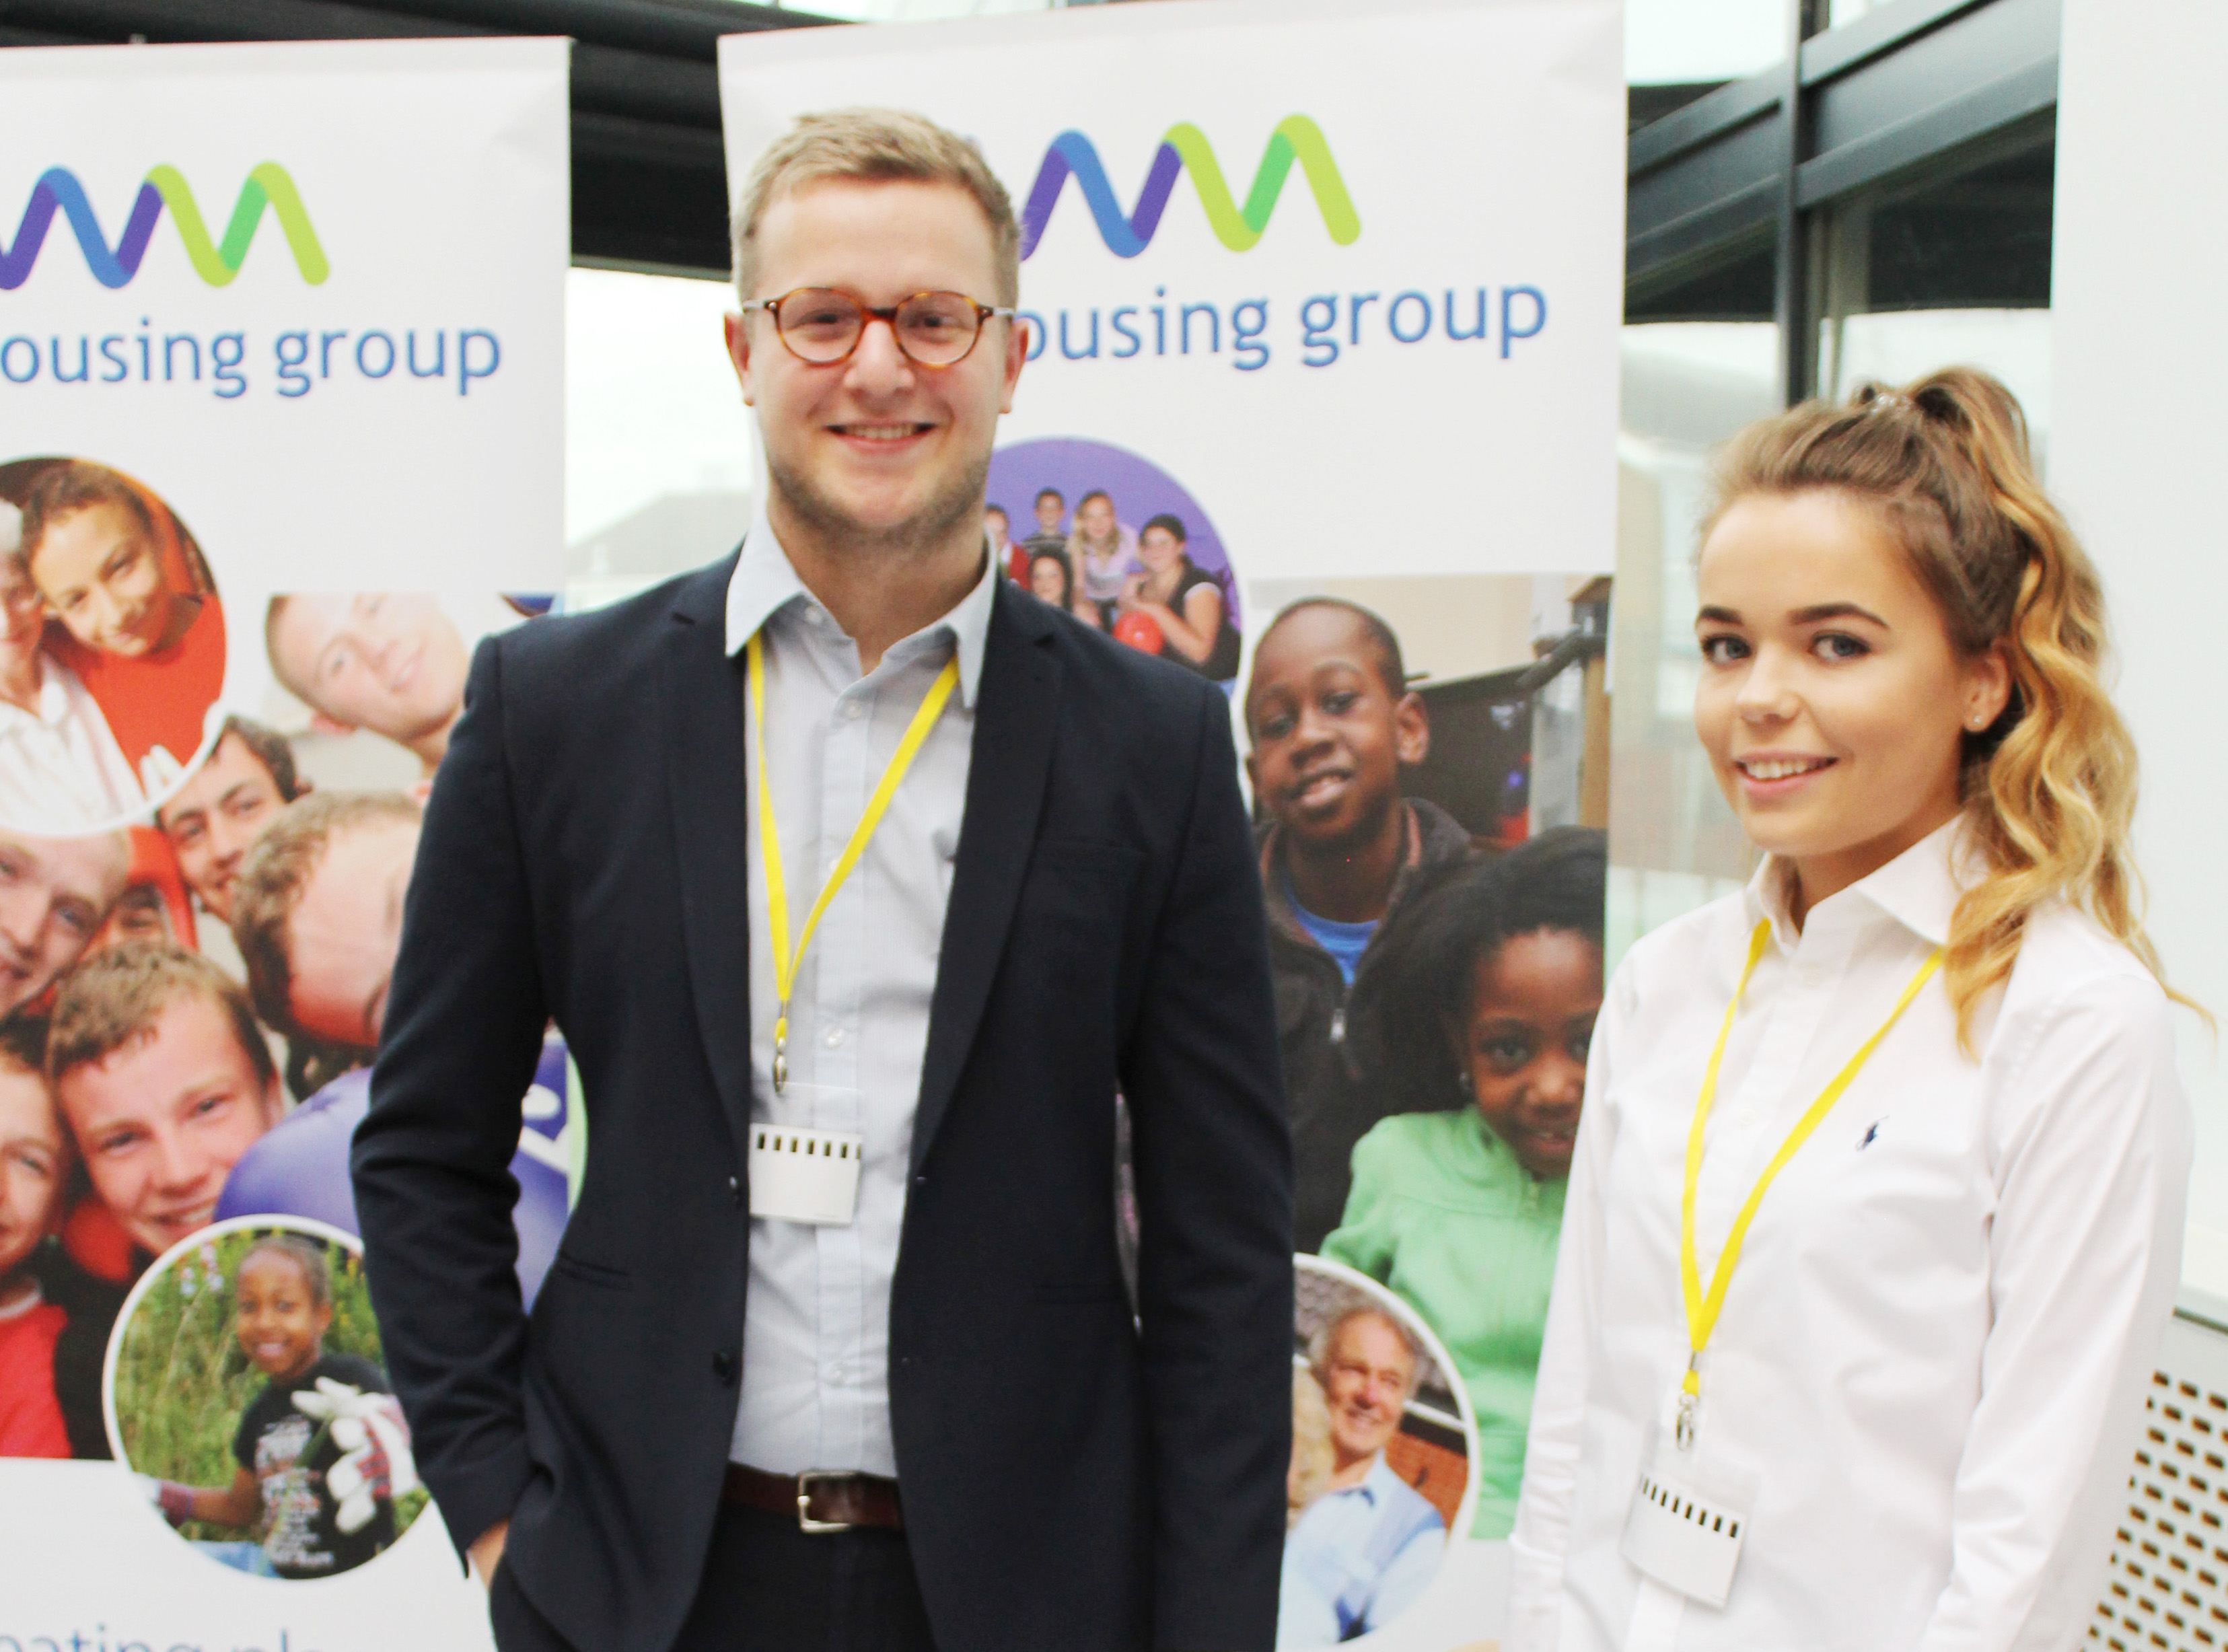 Alice Sale secures an HR apprenticeship at WM Housing